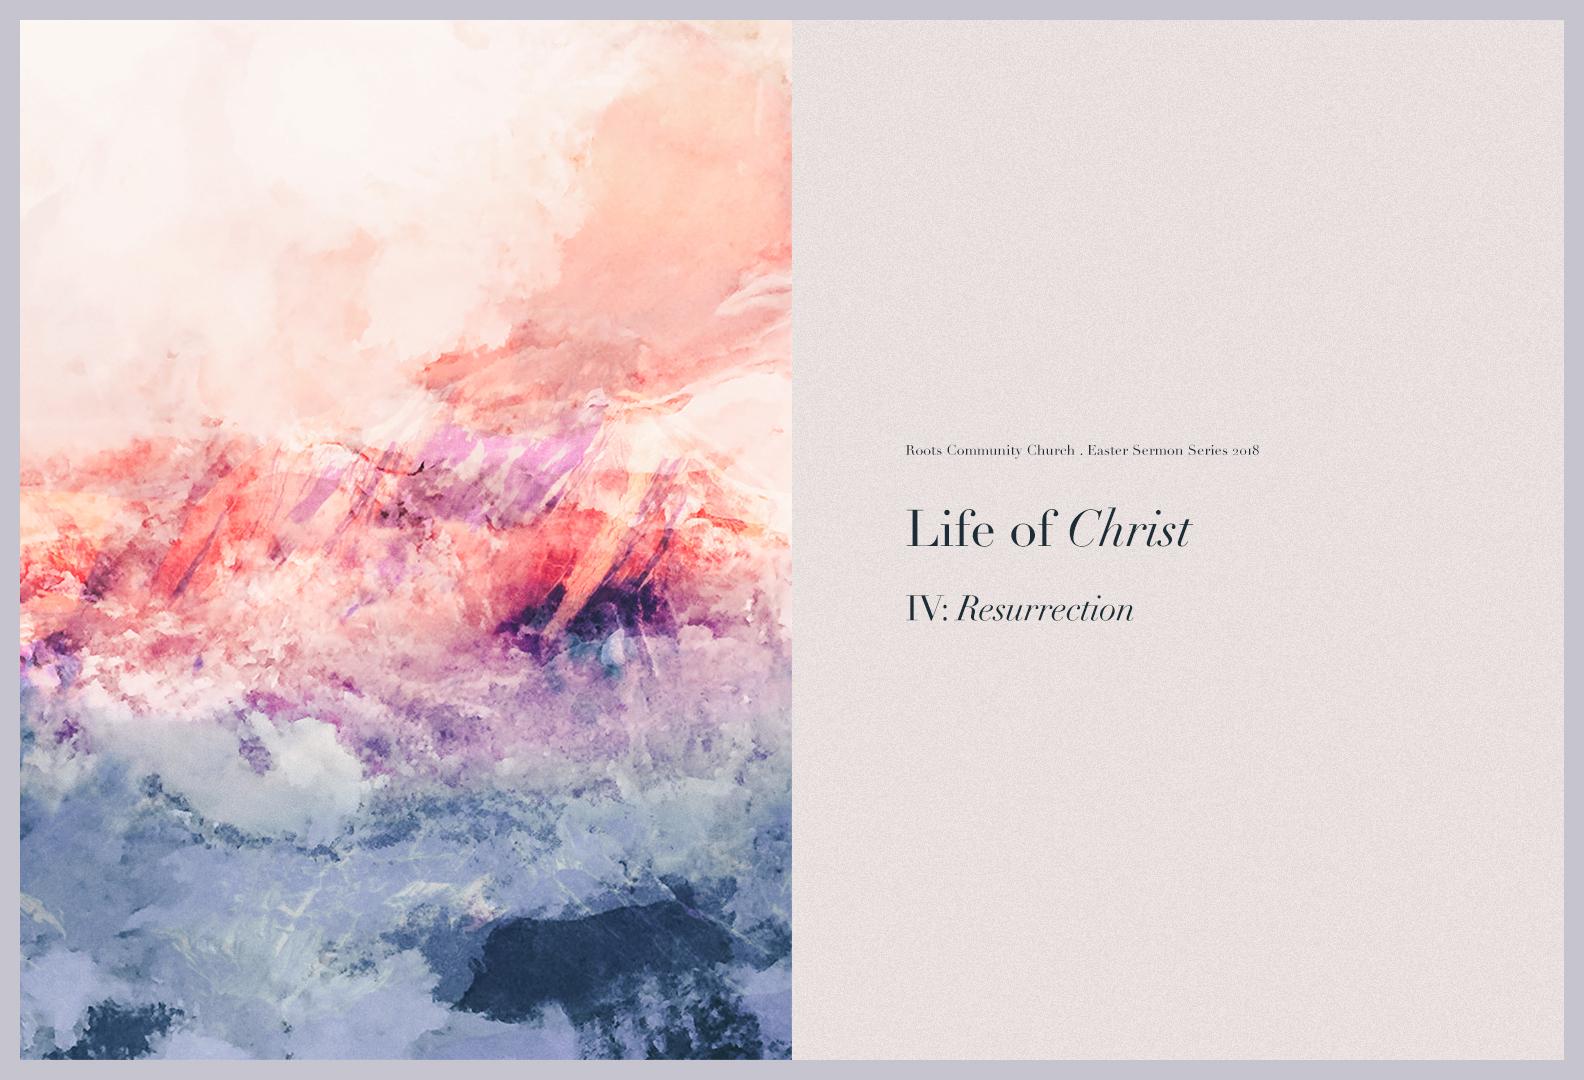 Life-of-Christ-sermon-roots-community-church-seattle